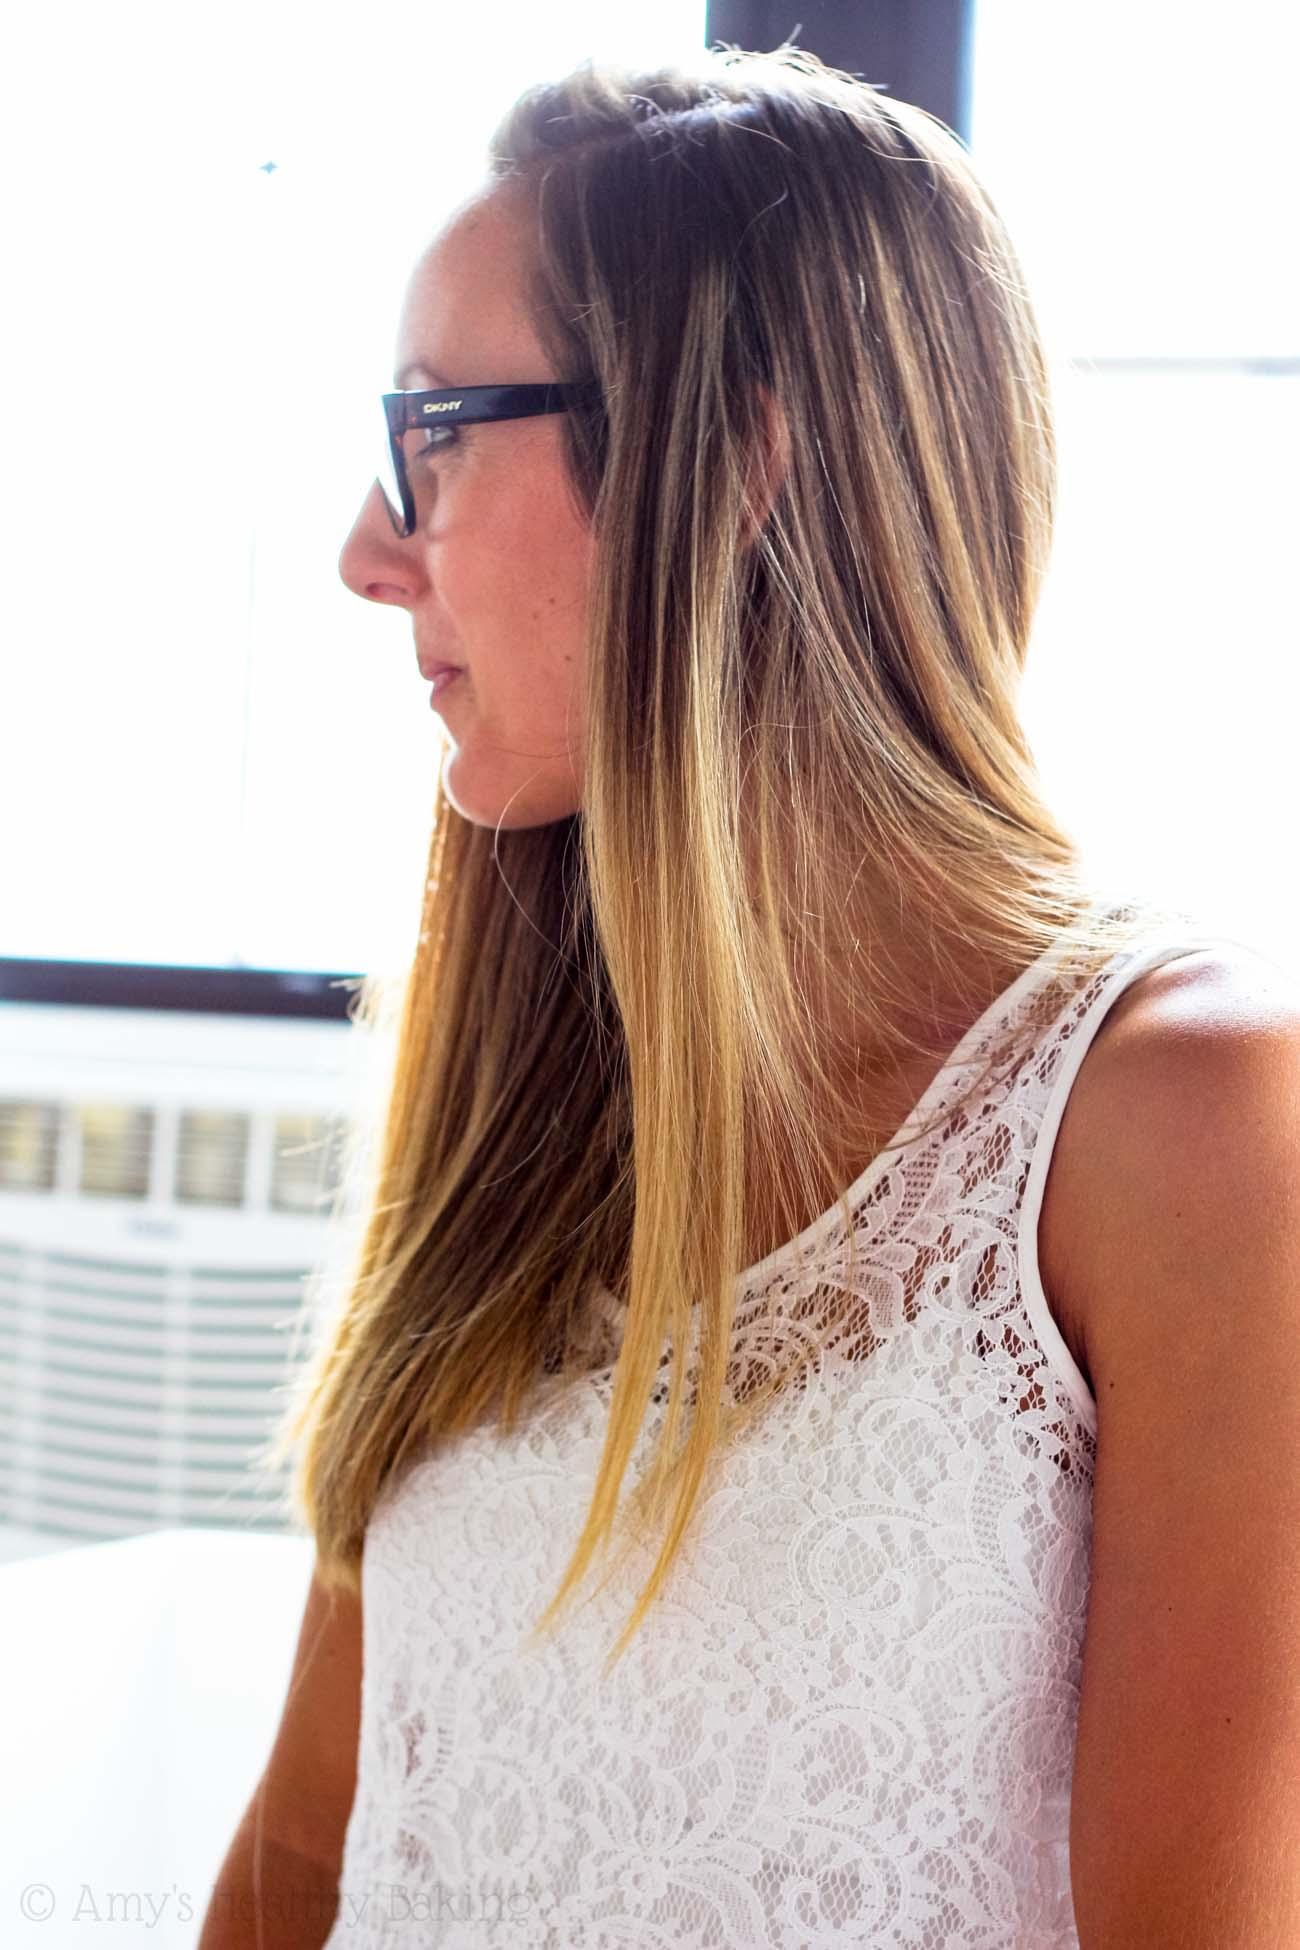 Lindsay from pinchofyum.com